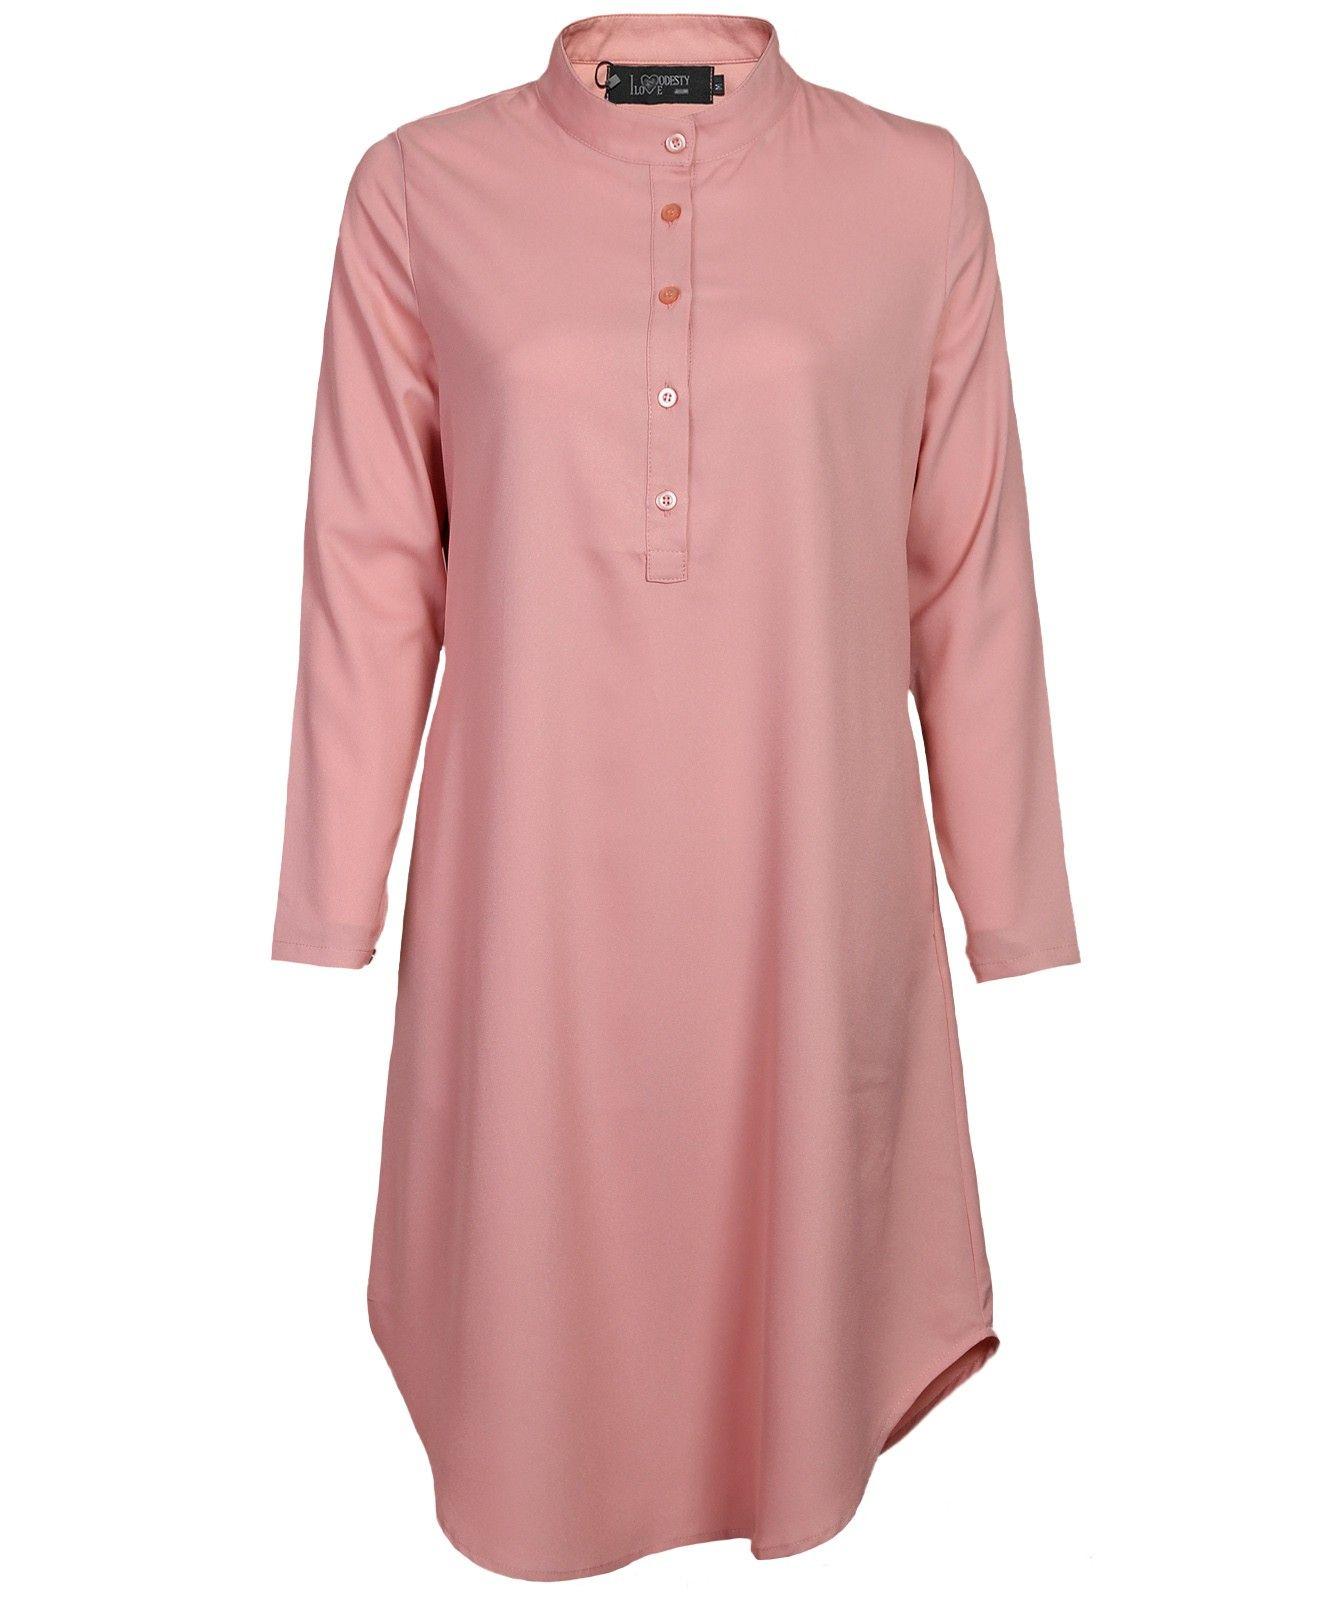 Salmon Long Dress Shirt I Love Modesty Modest Dressing